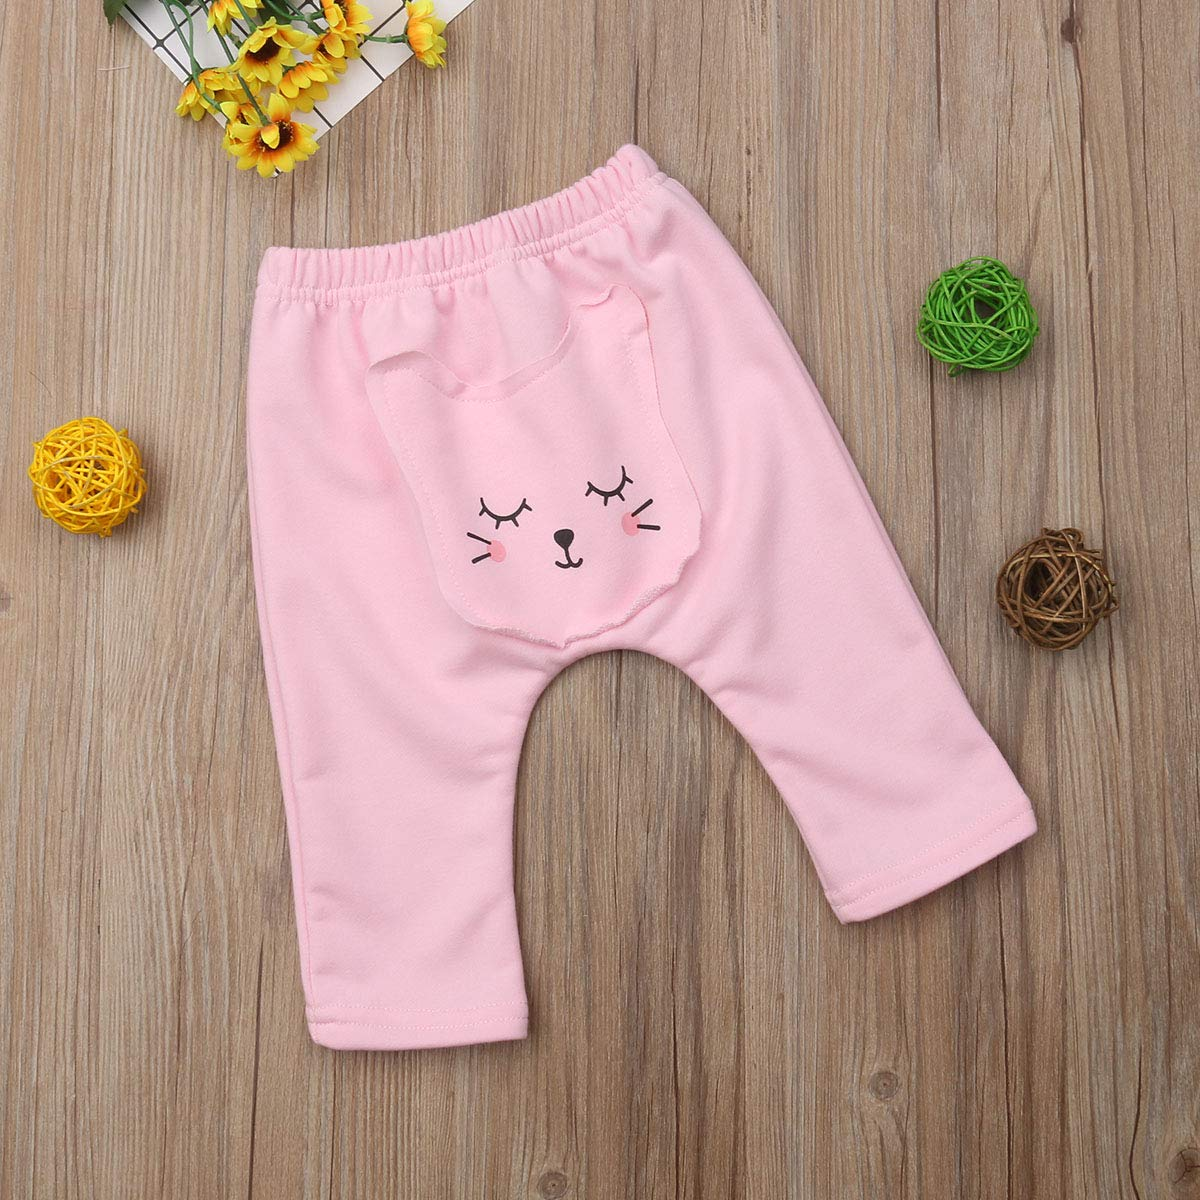 Newborn Infant Girls Boys Cute Animal Printed Cotton Legging Long Pants